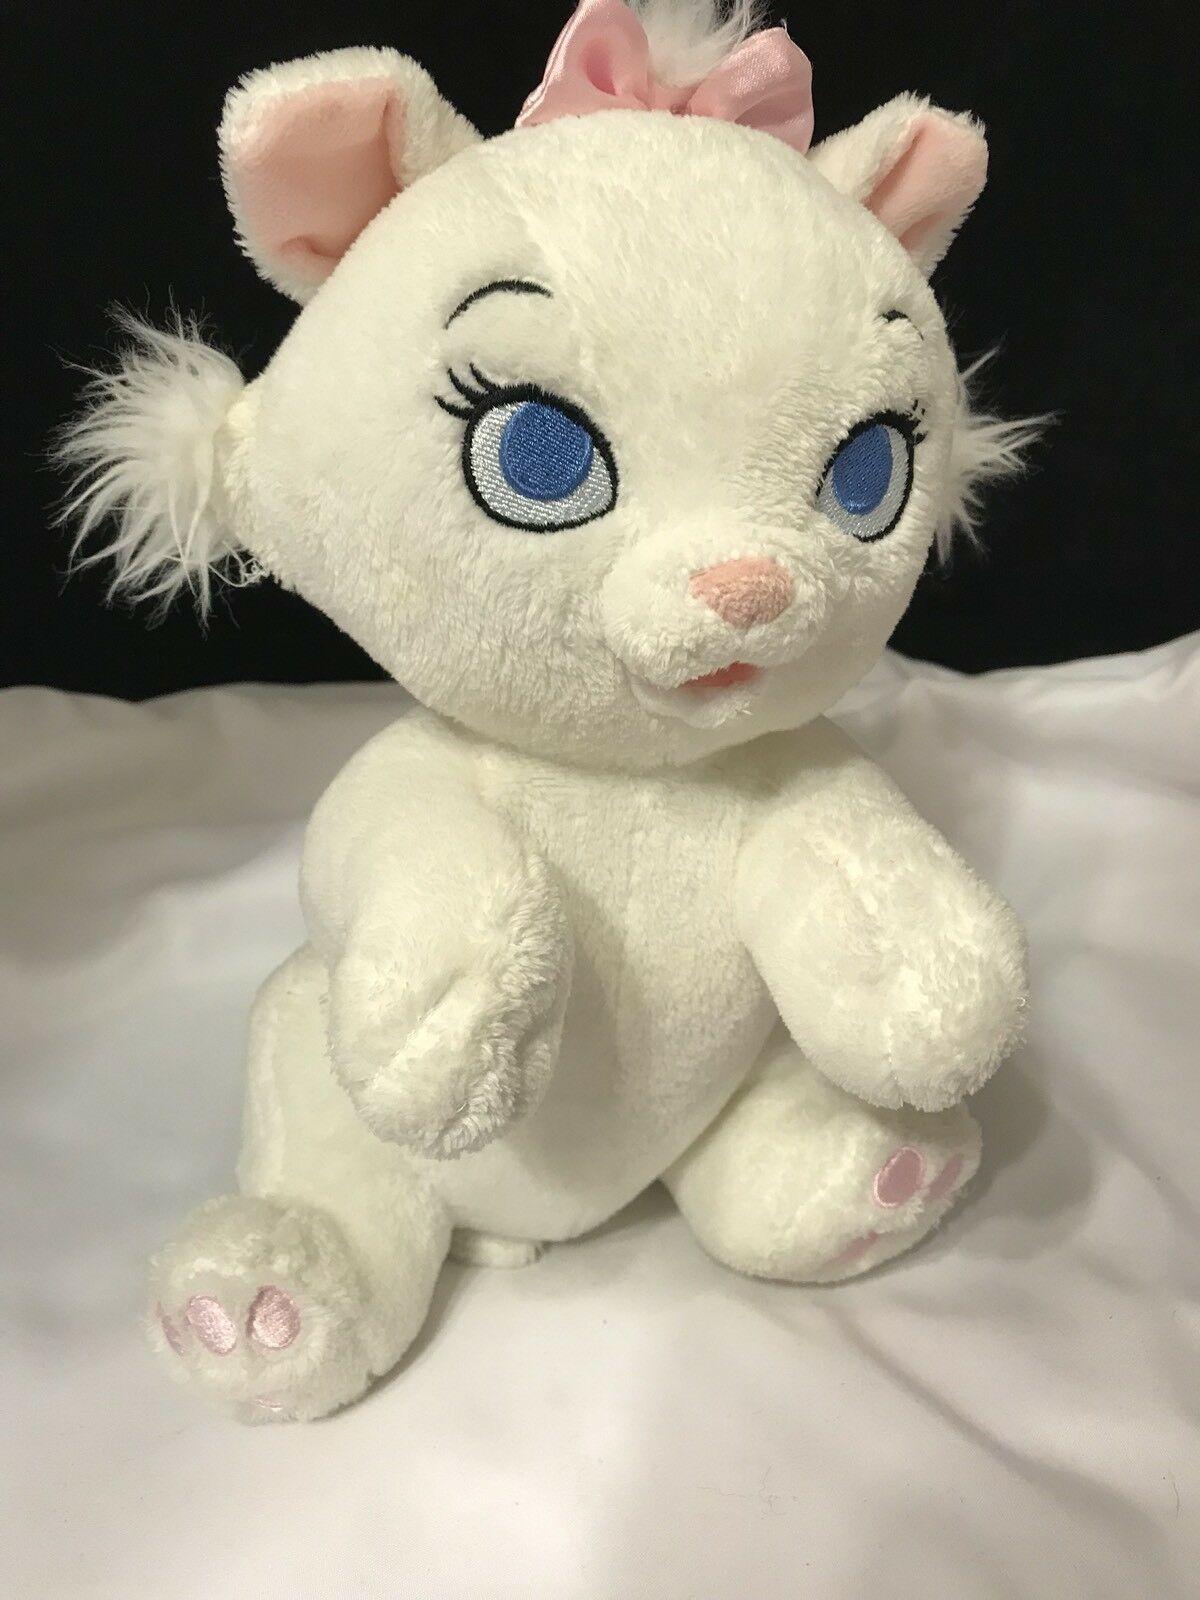 Disney Babies Monsters Inc Doll Security Blanket Plush Stuffed Lot Simba Boo +